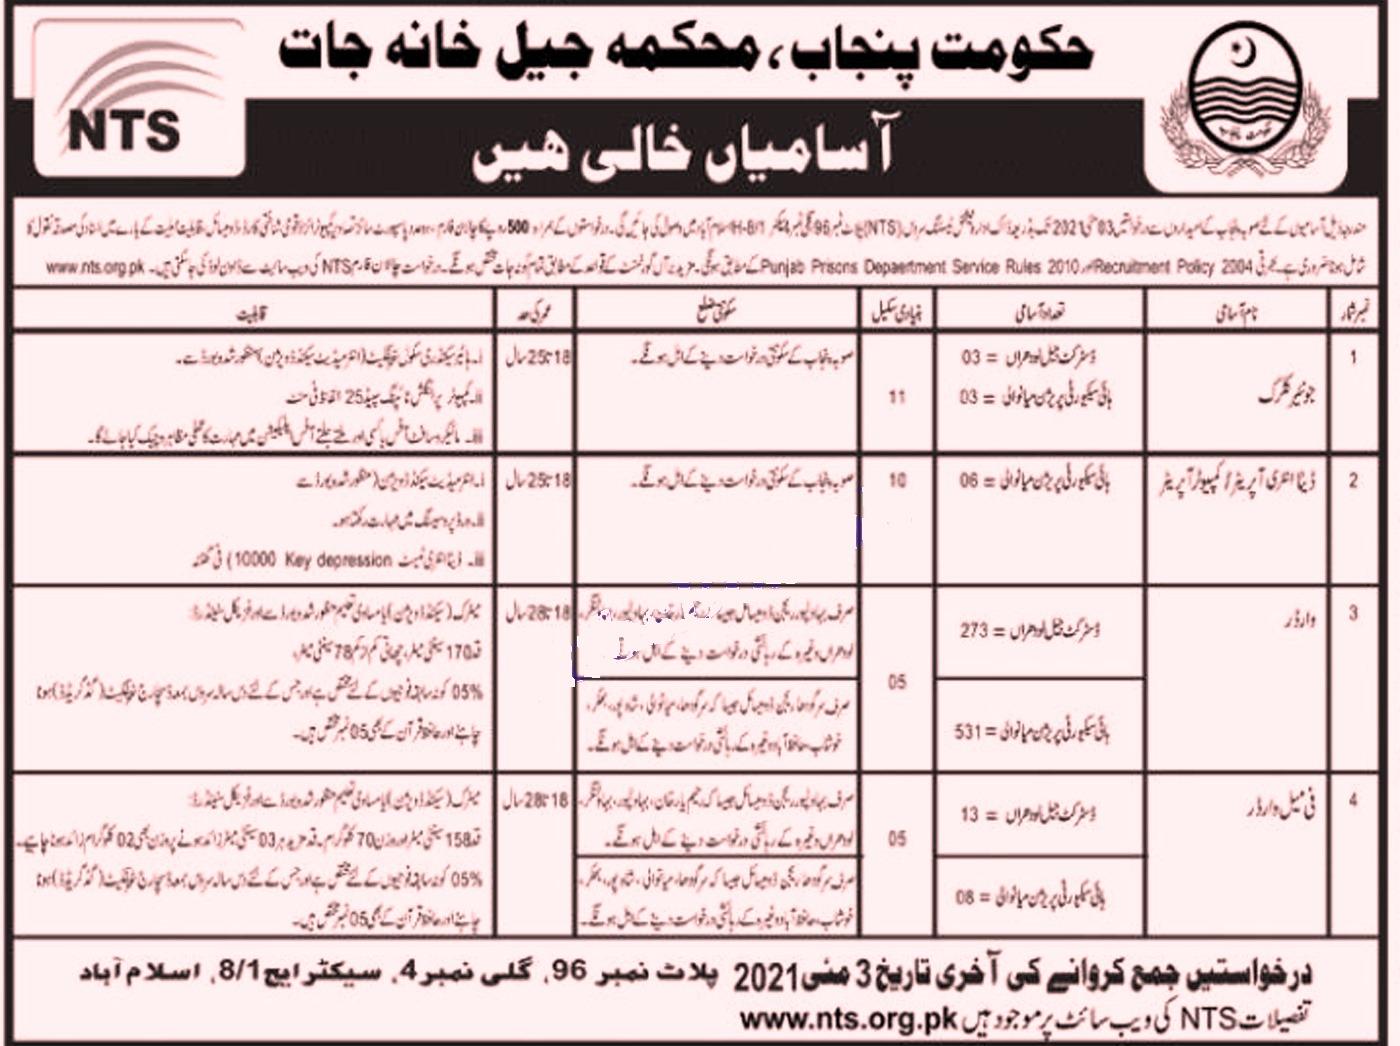 Prison Punjab Department Jobs 2021 Online Apply nts.org.pk